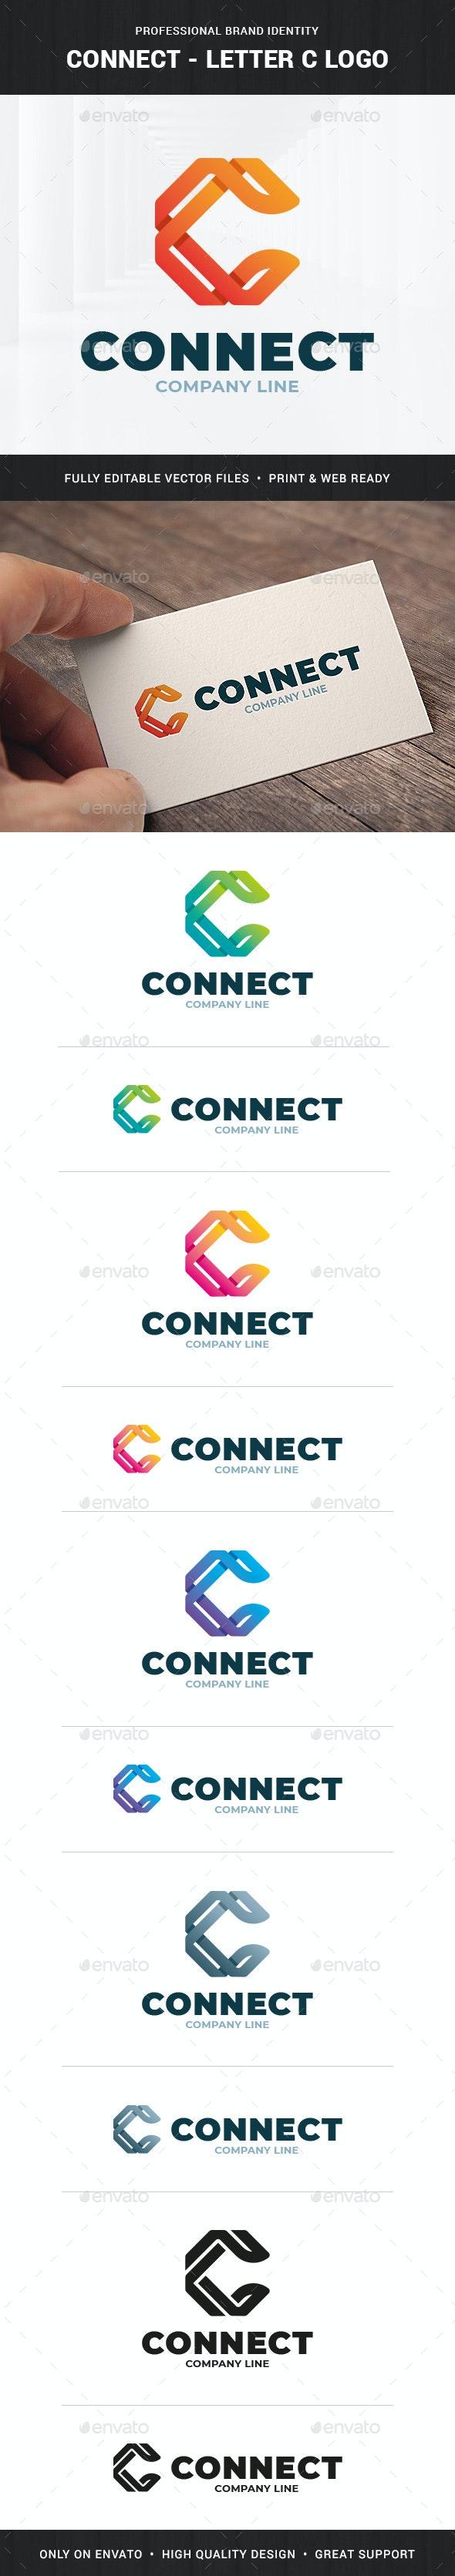 Connect - Letter C Logo Template - Letters Logo Templates